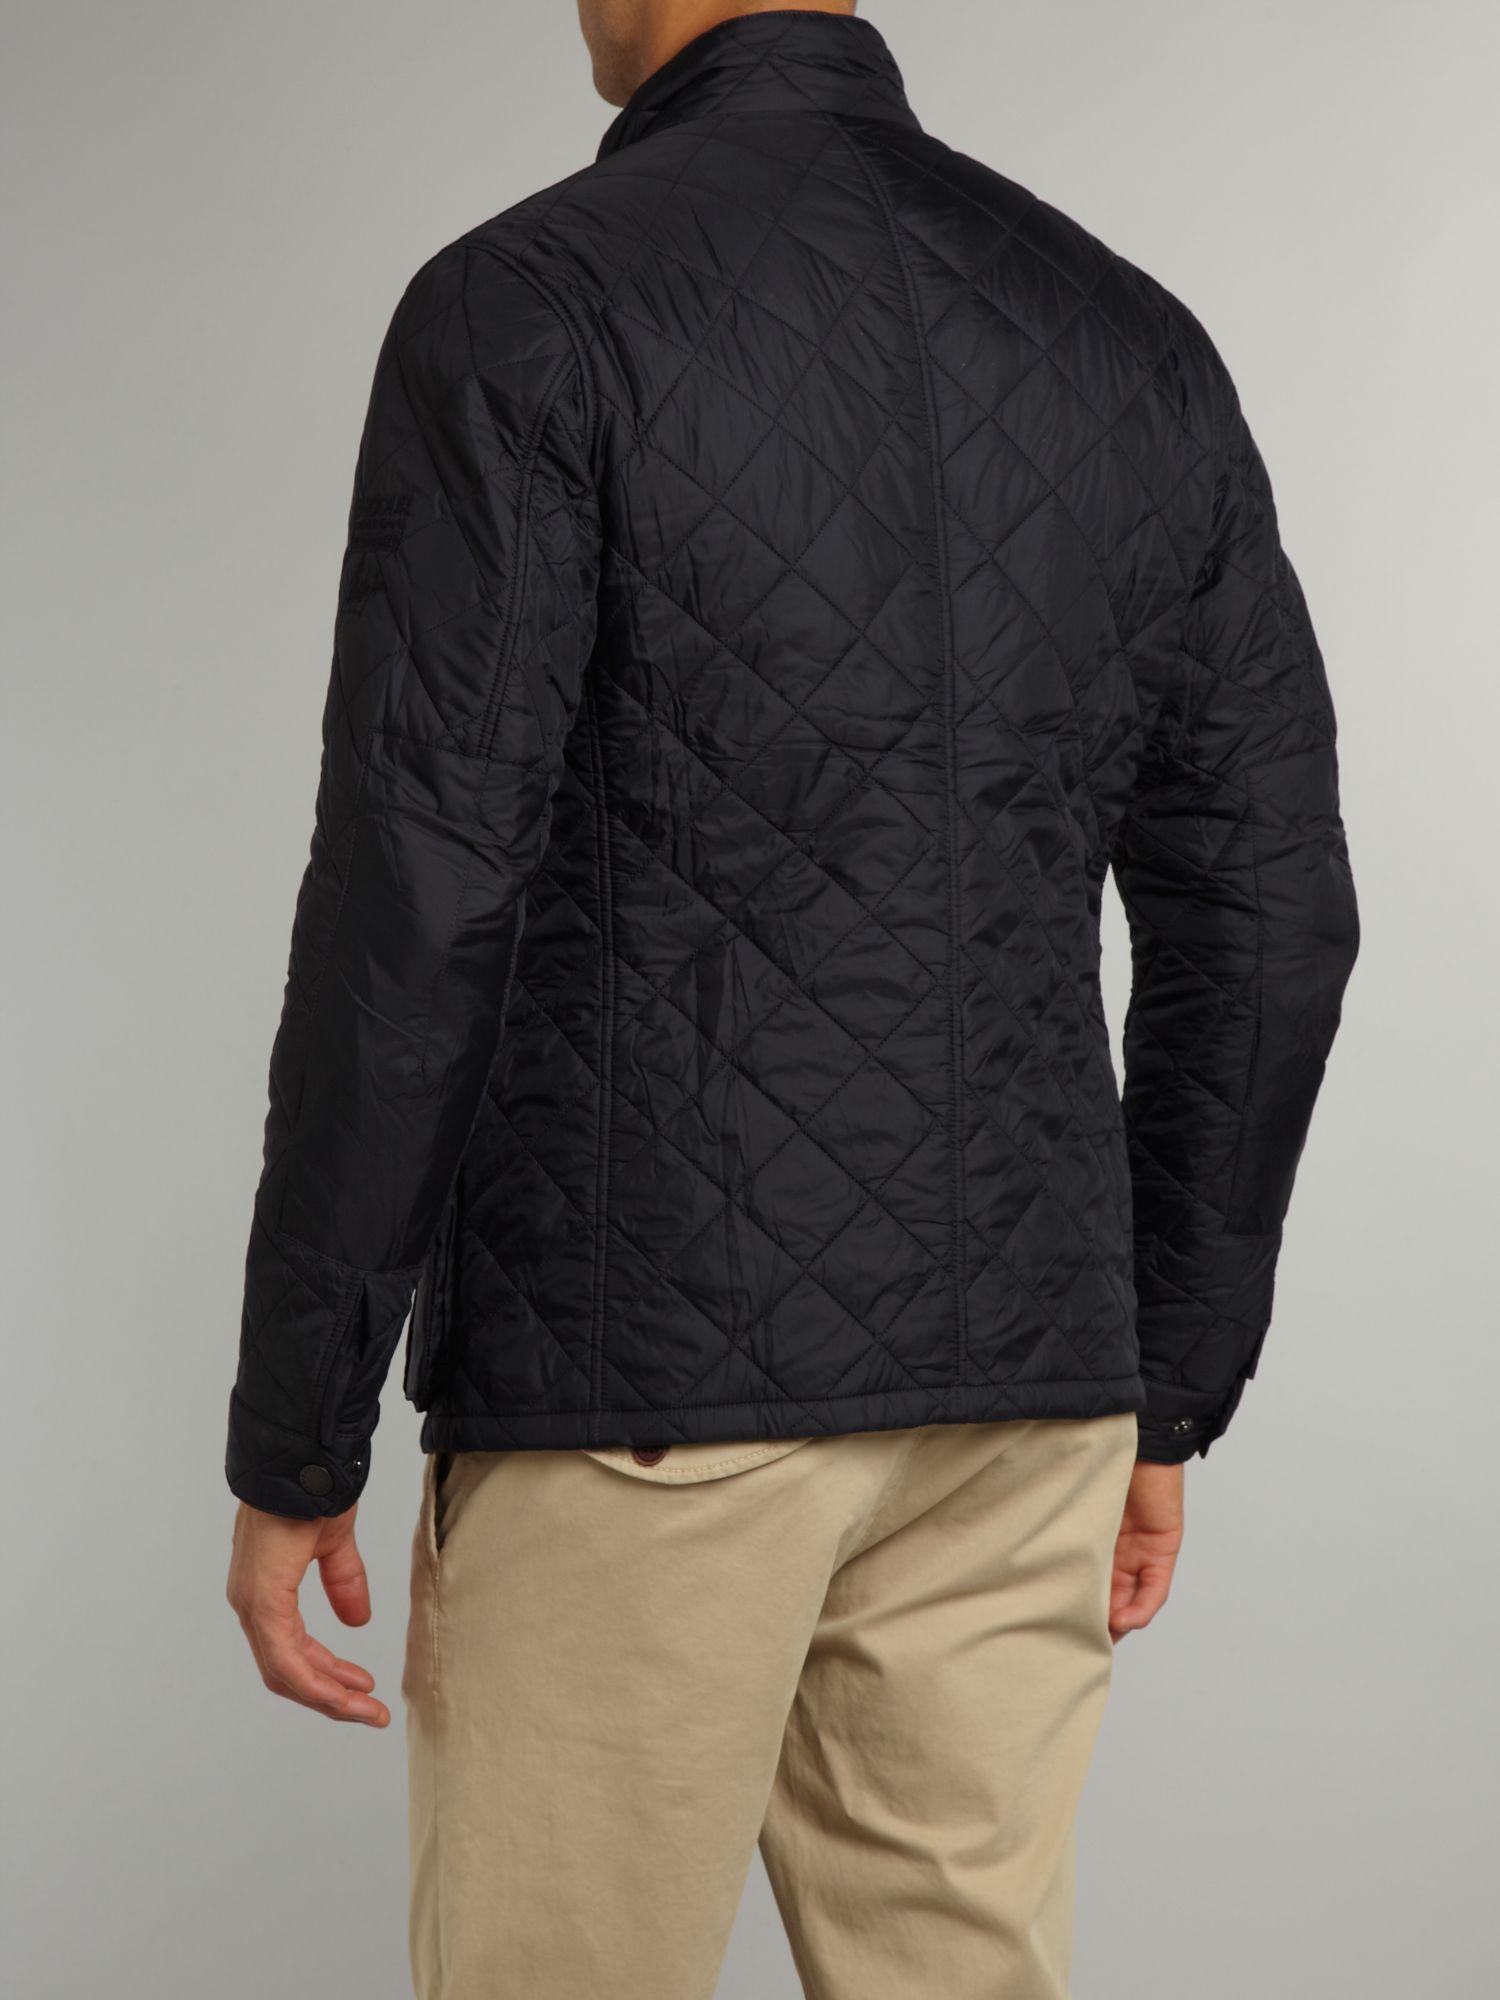 Lyst Barbour Quilted Steve Mcqueen Jefferies Jacket In Blue For Men